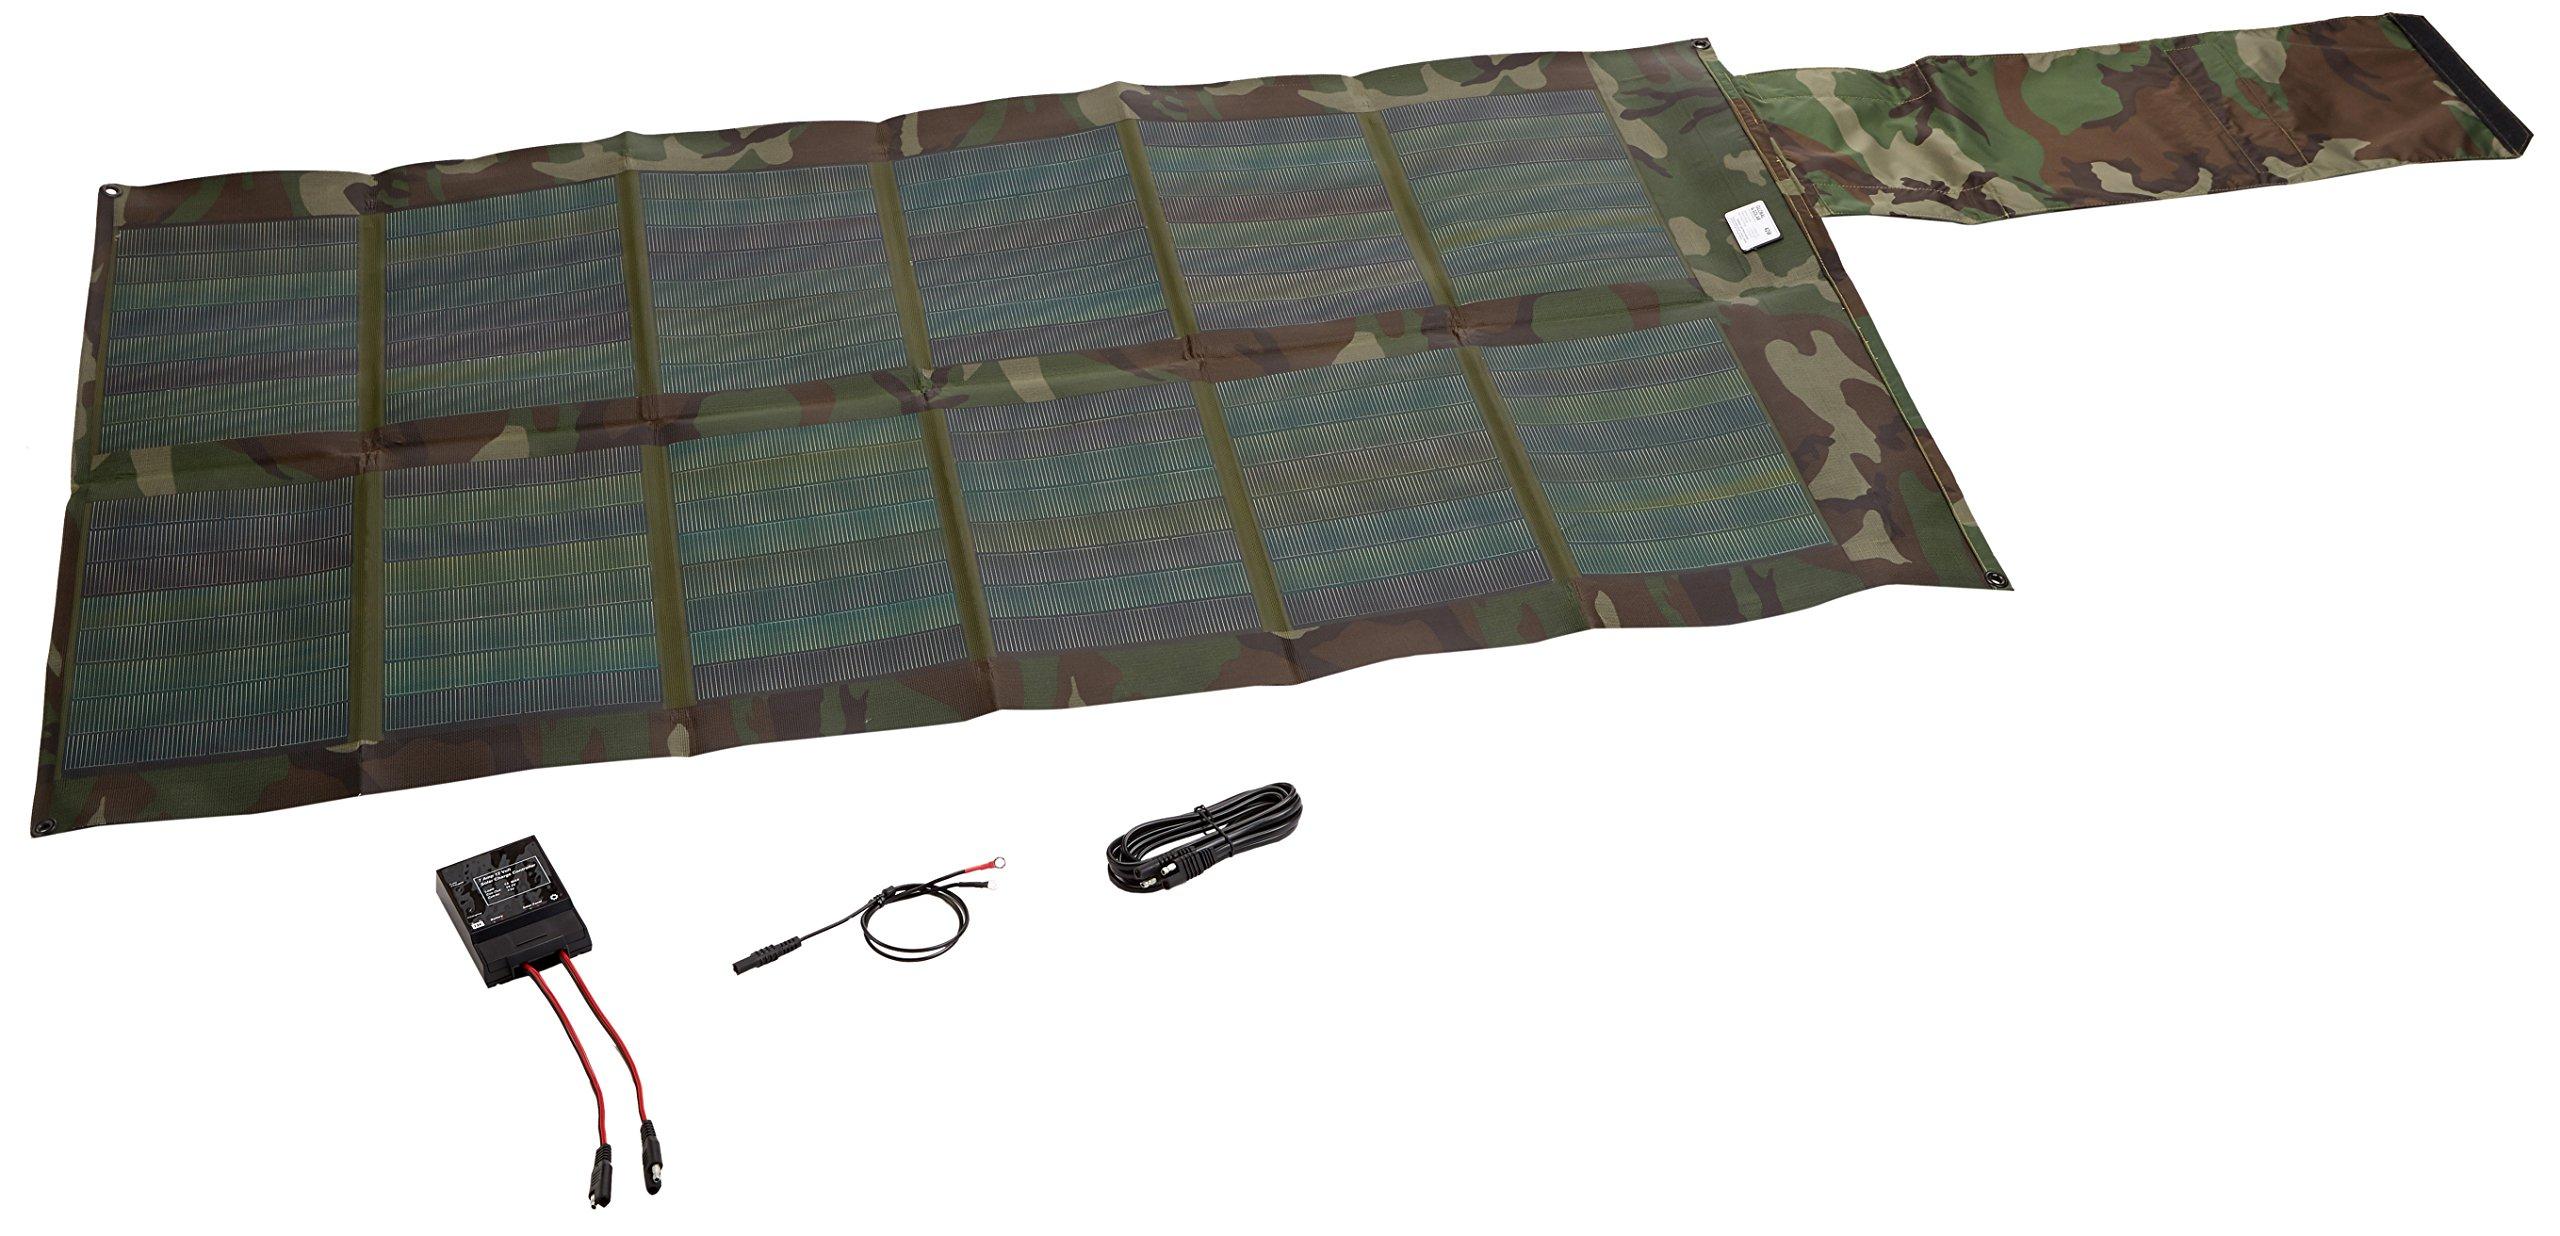 Sunlinq 22042S Solar Battery Charger, 42 Watt, 12V